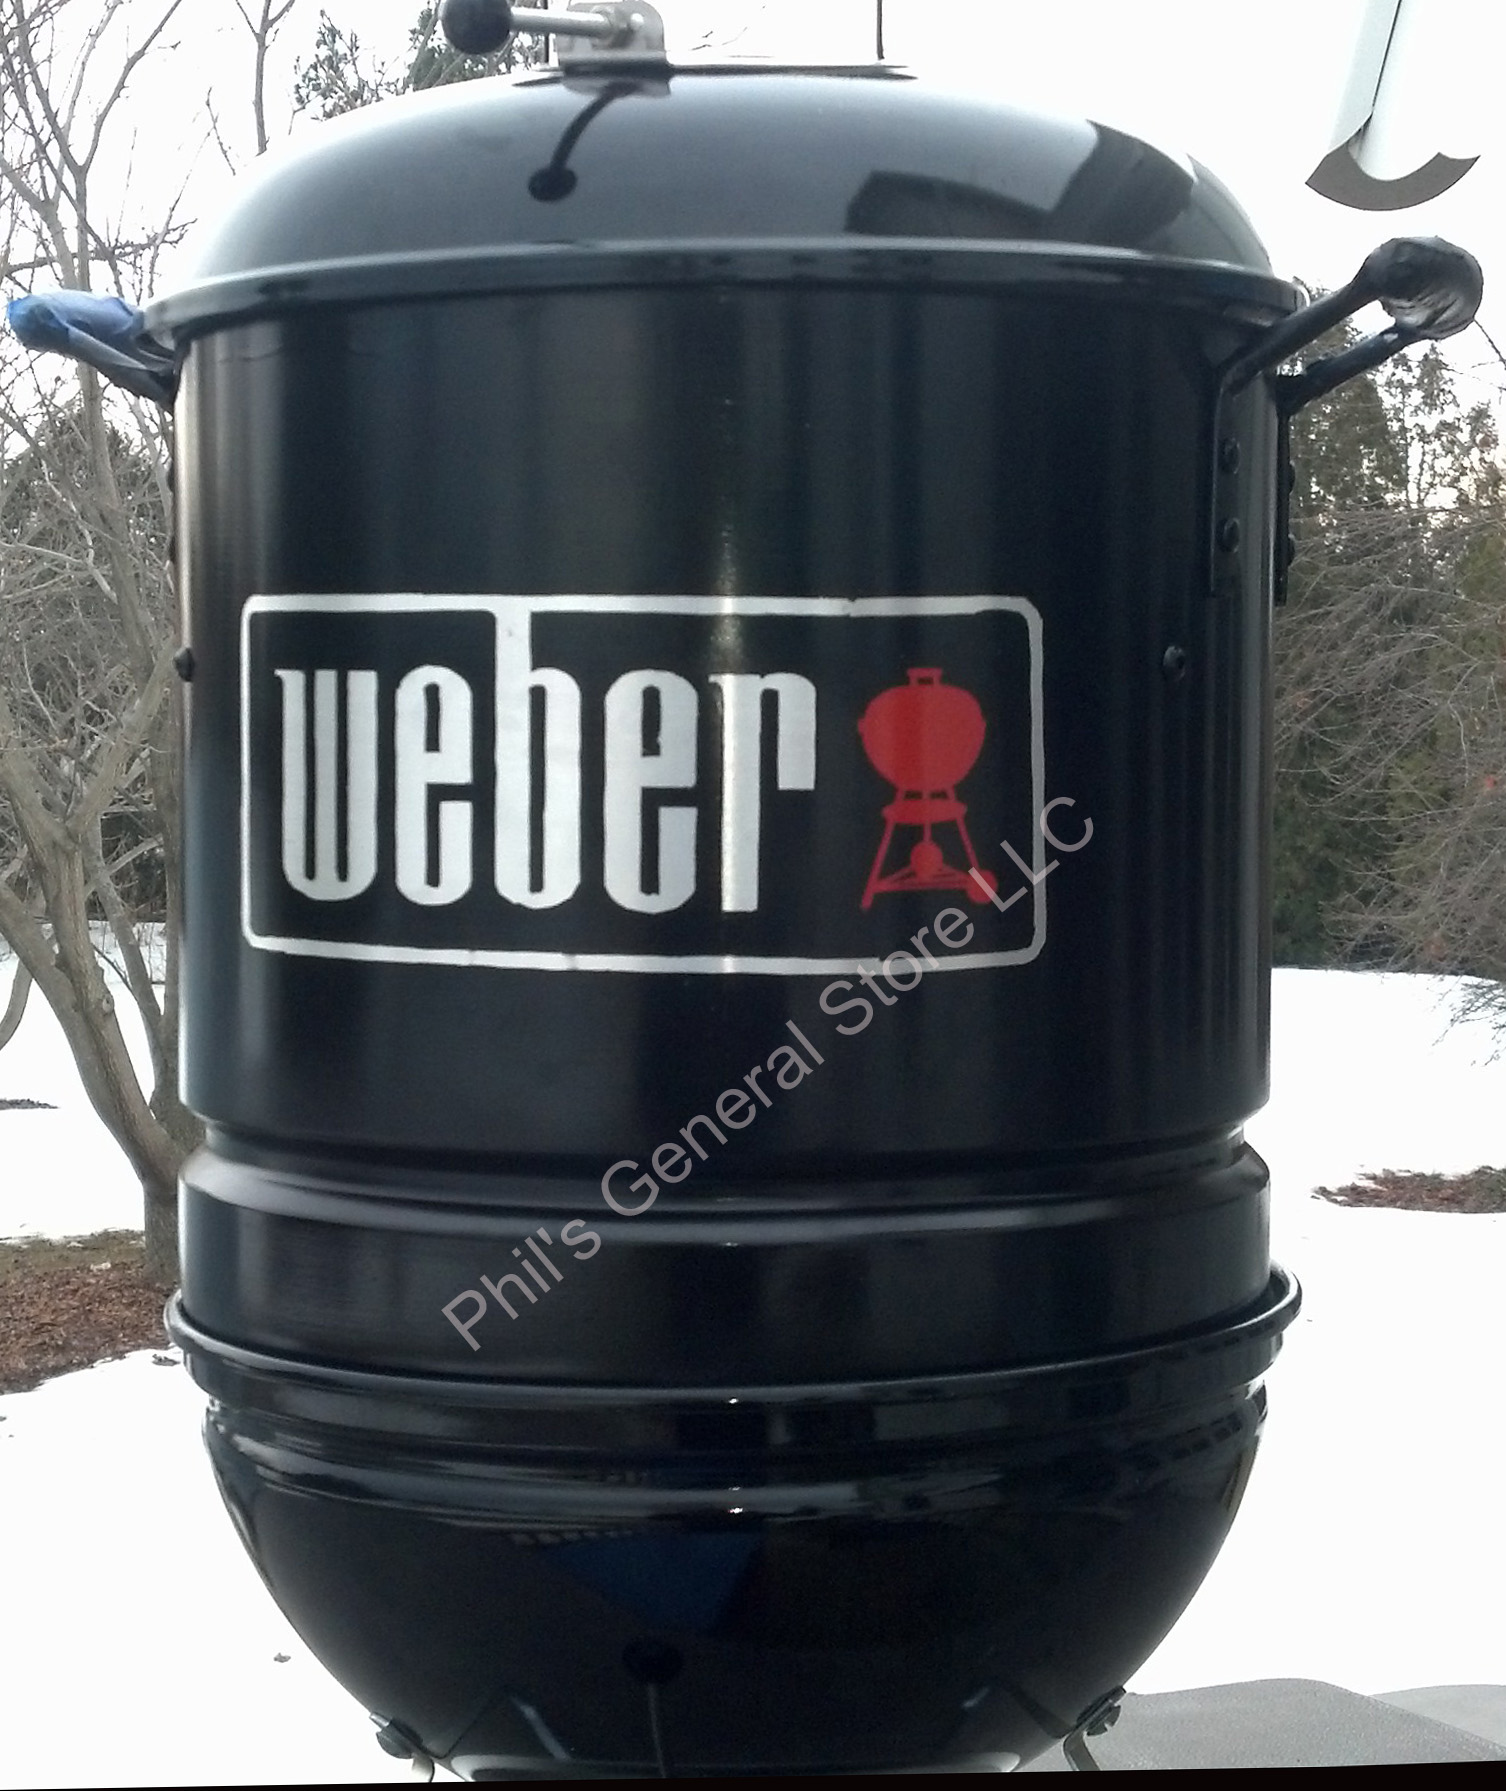 mini wsm smoker kit fits weber smokey joe charcoal grill. Black Bedroom Furniture Sets. Home Design Ideas